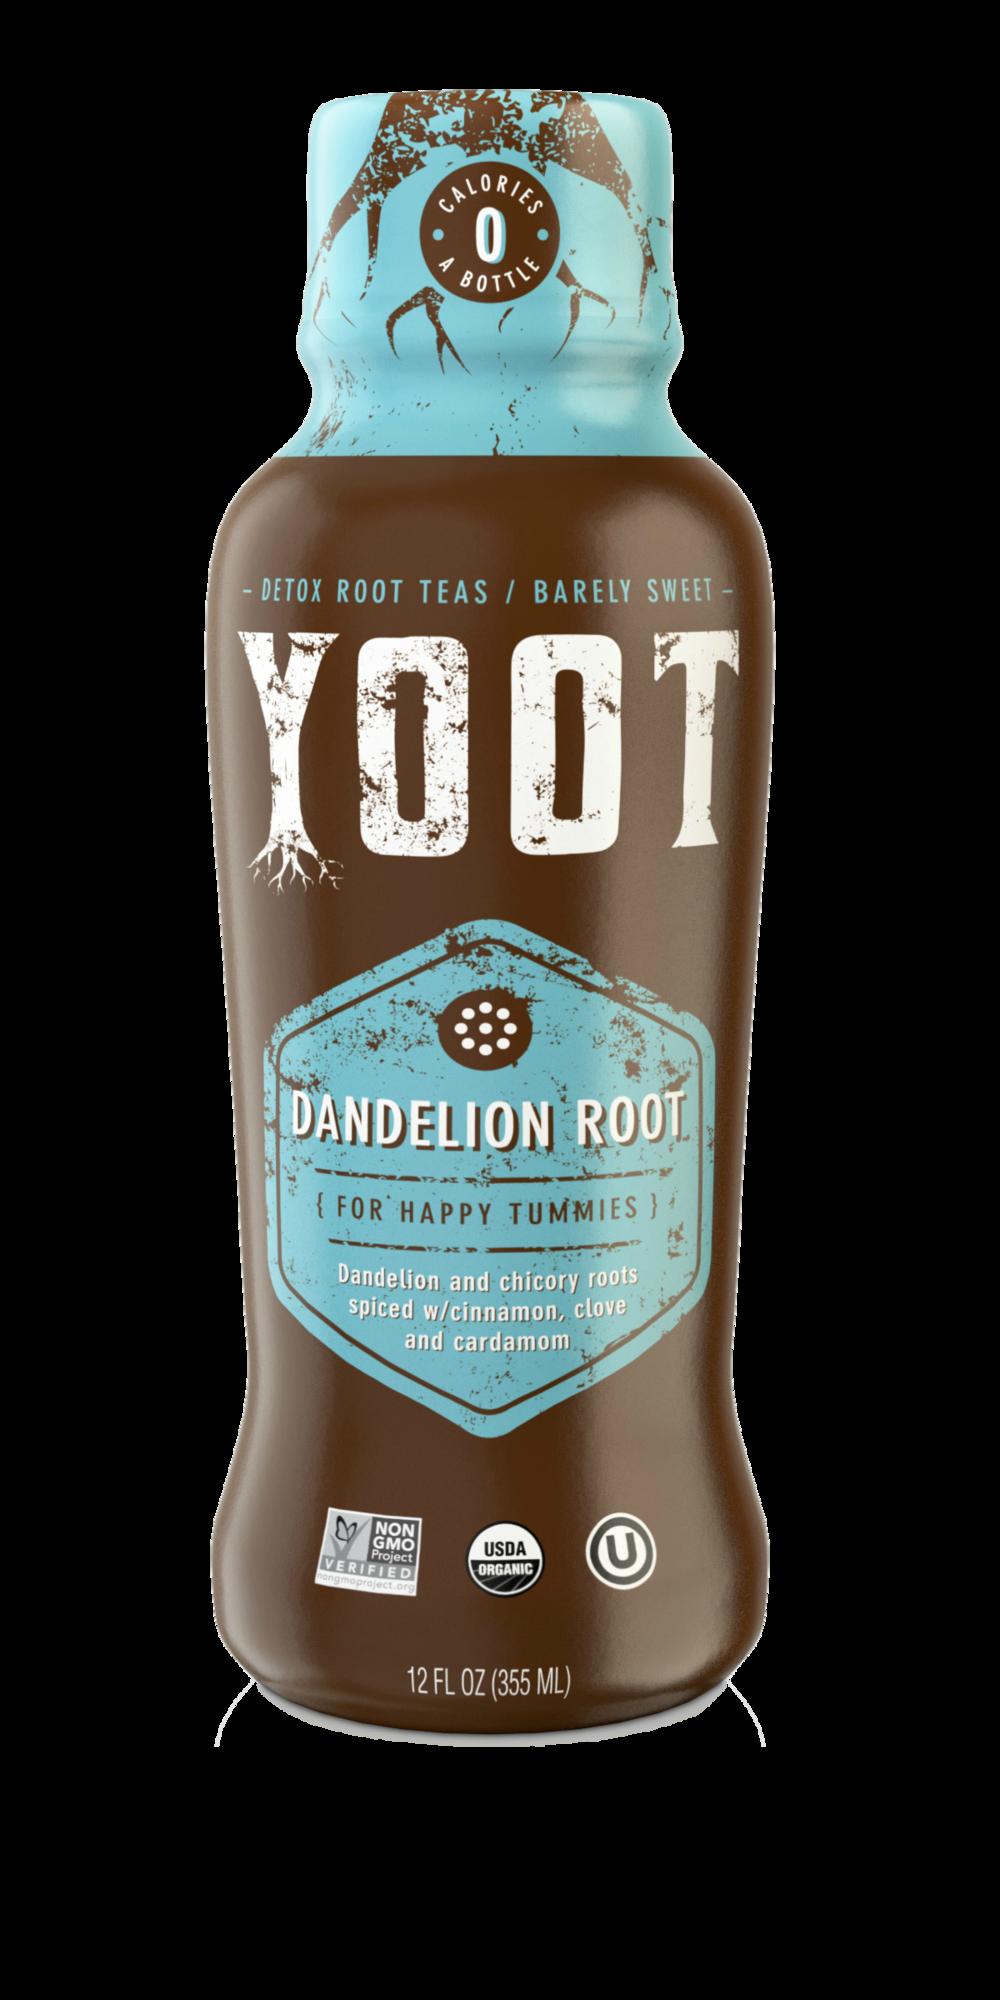 Dandelion Root Tea - [ For Happy Tummies ]12 Fl oz (355 ml)